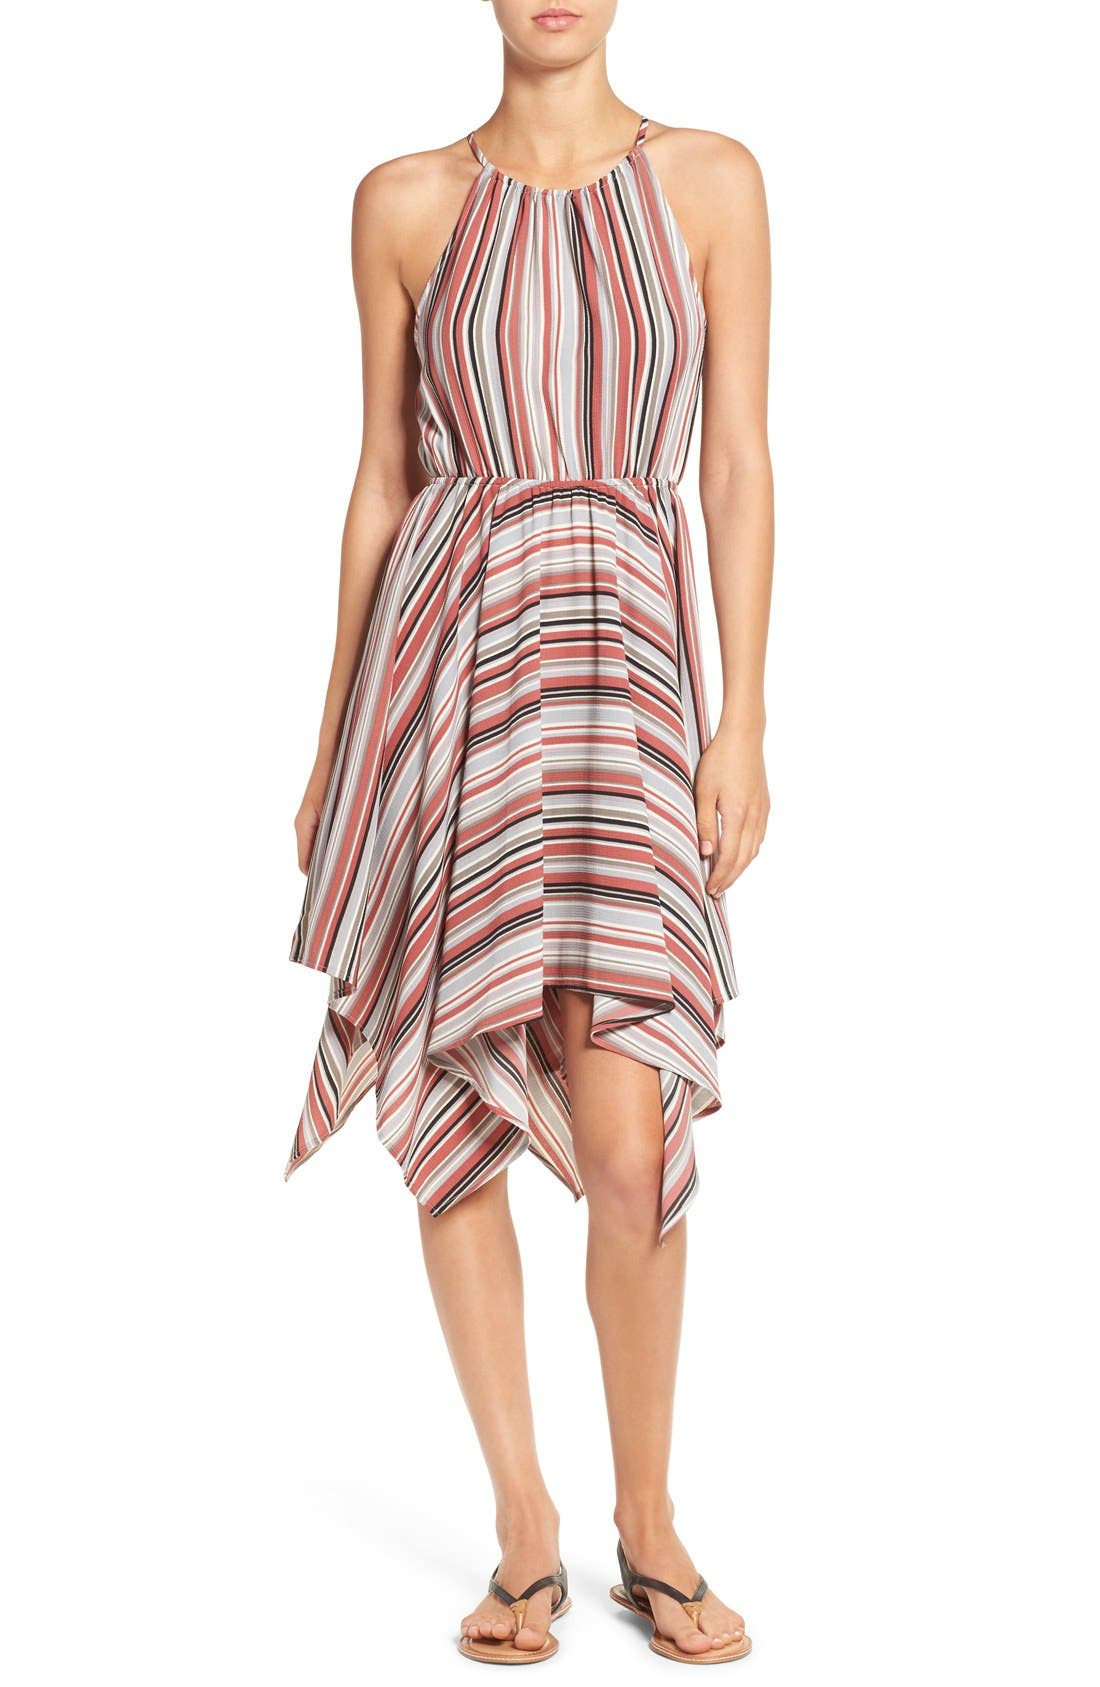 Alternate Image 1 Selected - Soprano Stripe Handkerchief Hem Halter Dress